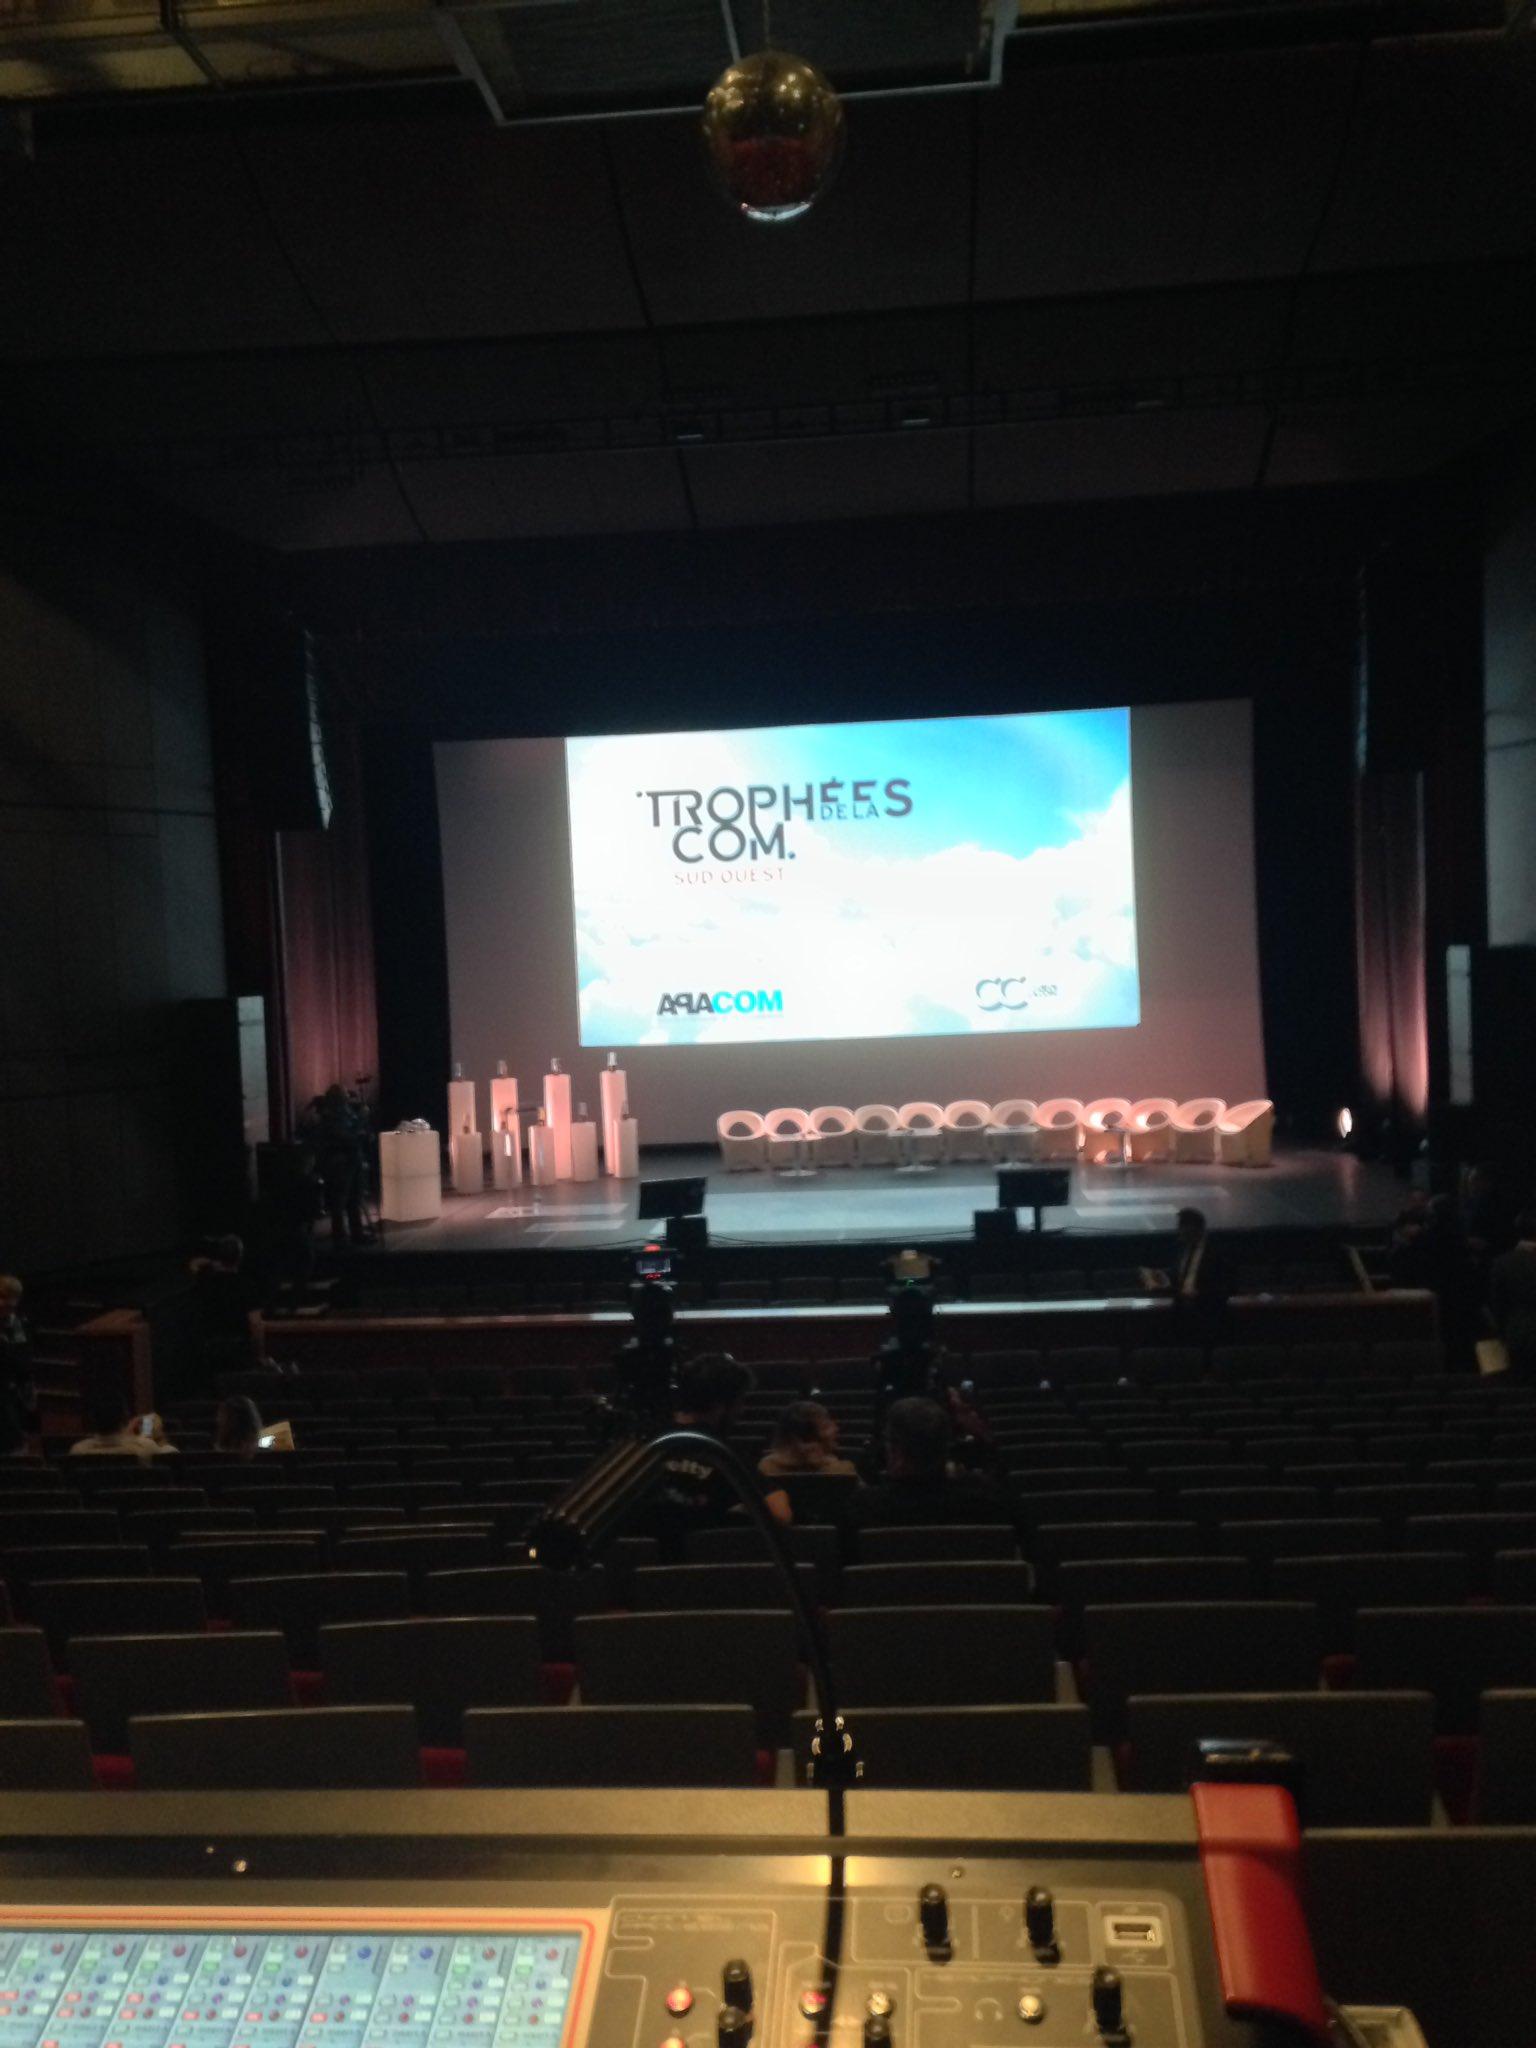 On stage... #TropheesCom On n'attend plus que ... vous ! https://t.co/gKvfjstT9K